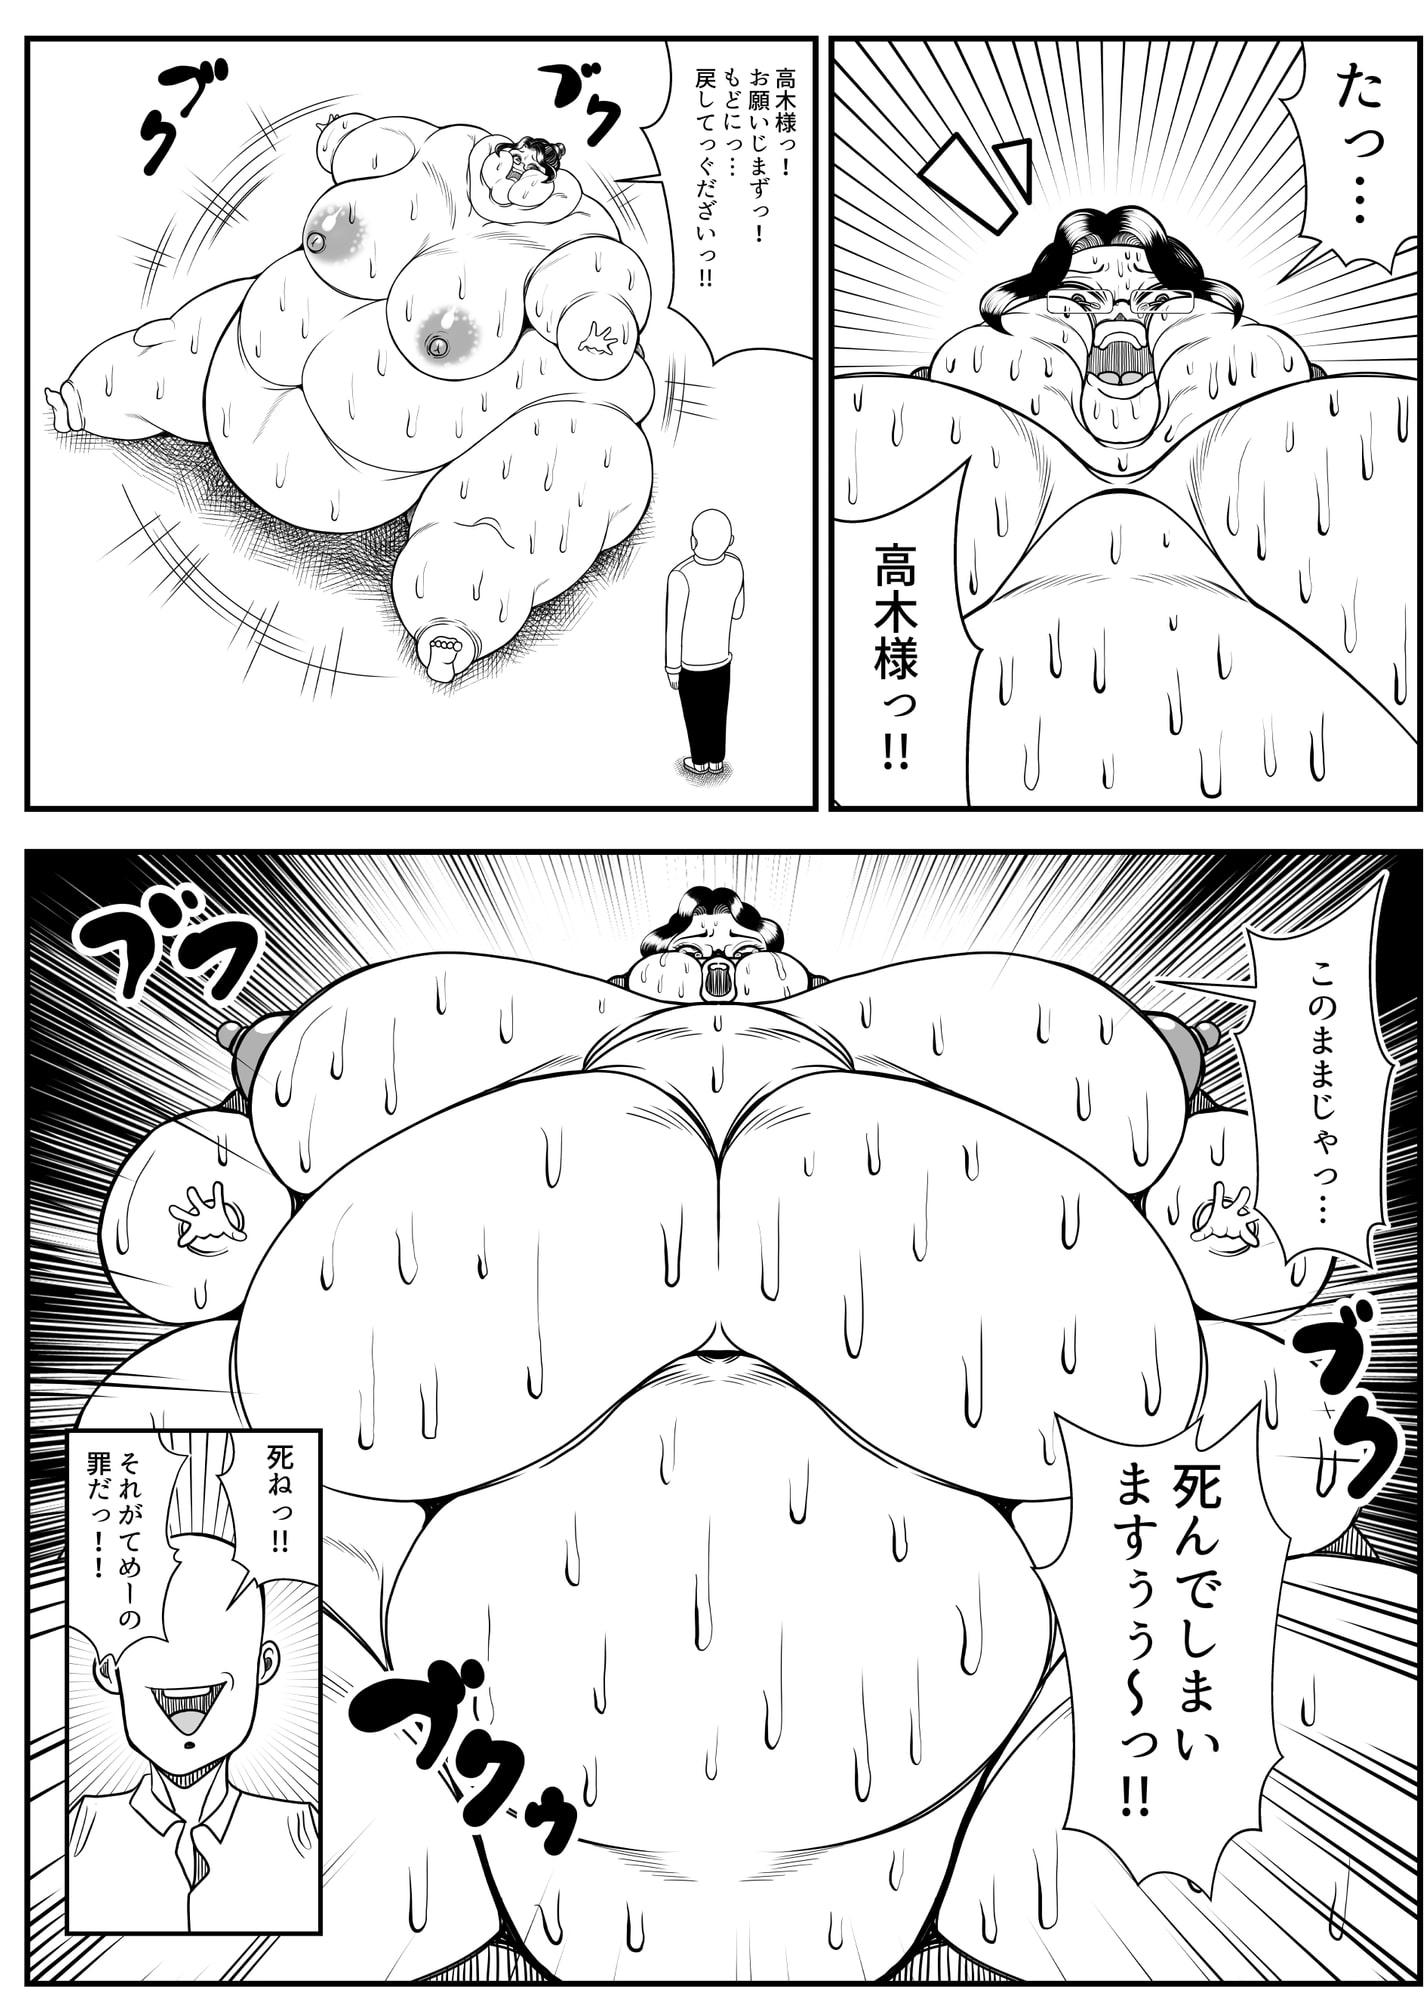 肥満化アプリ(熟女学年主任編)